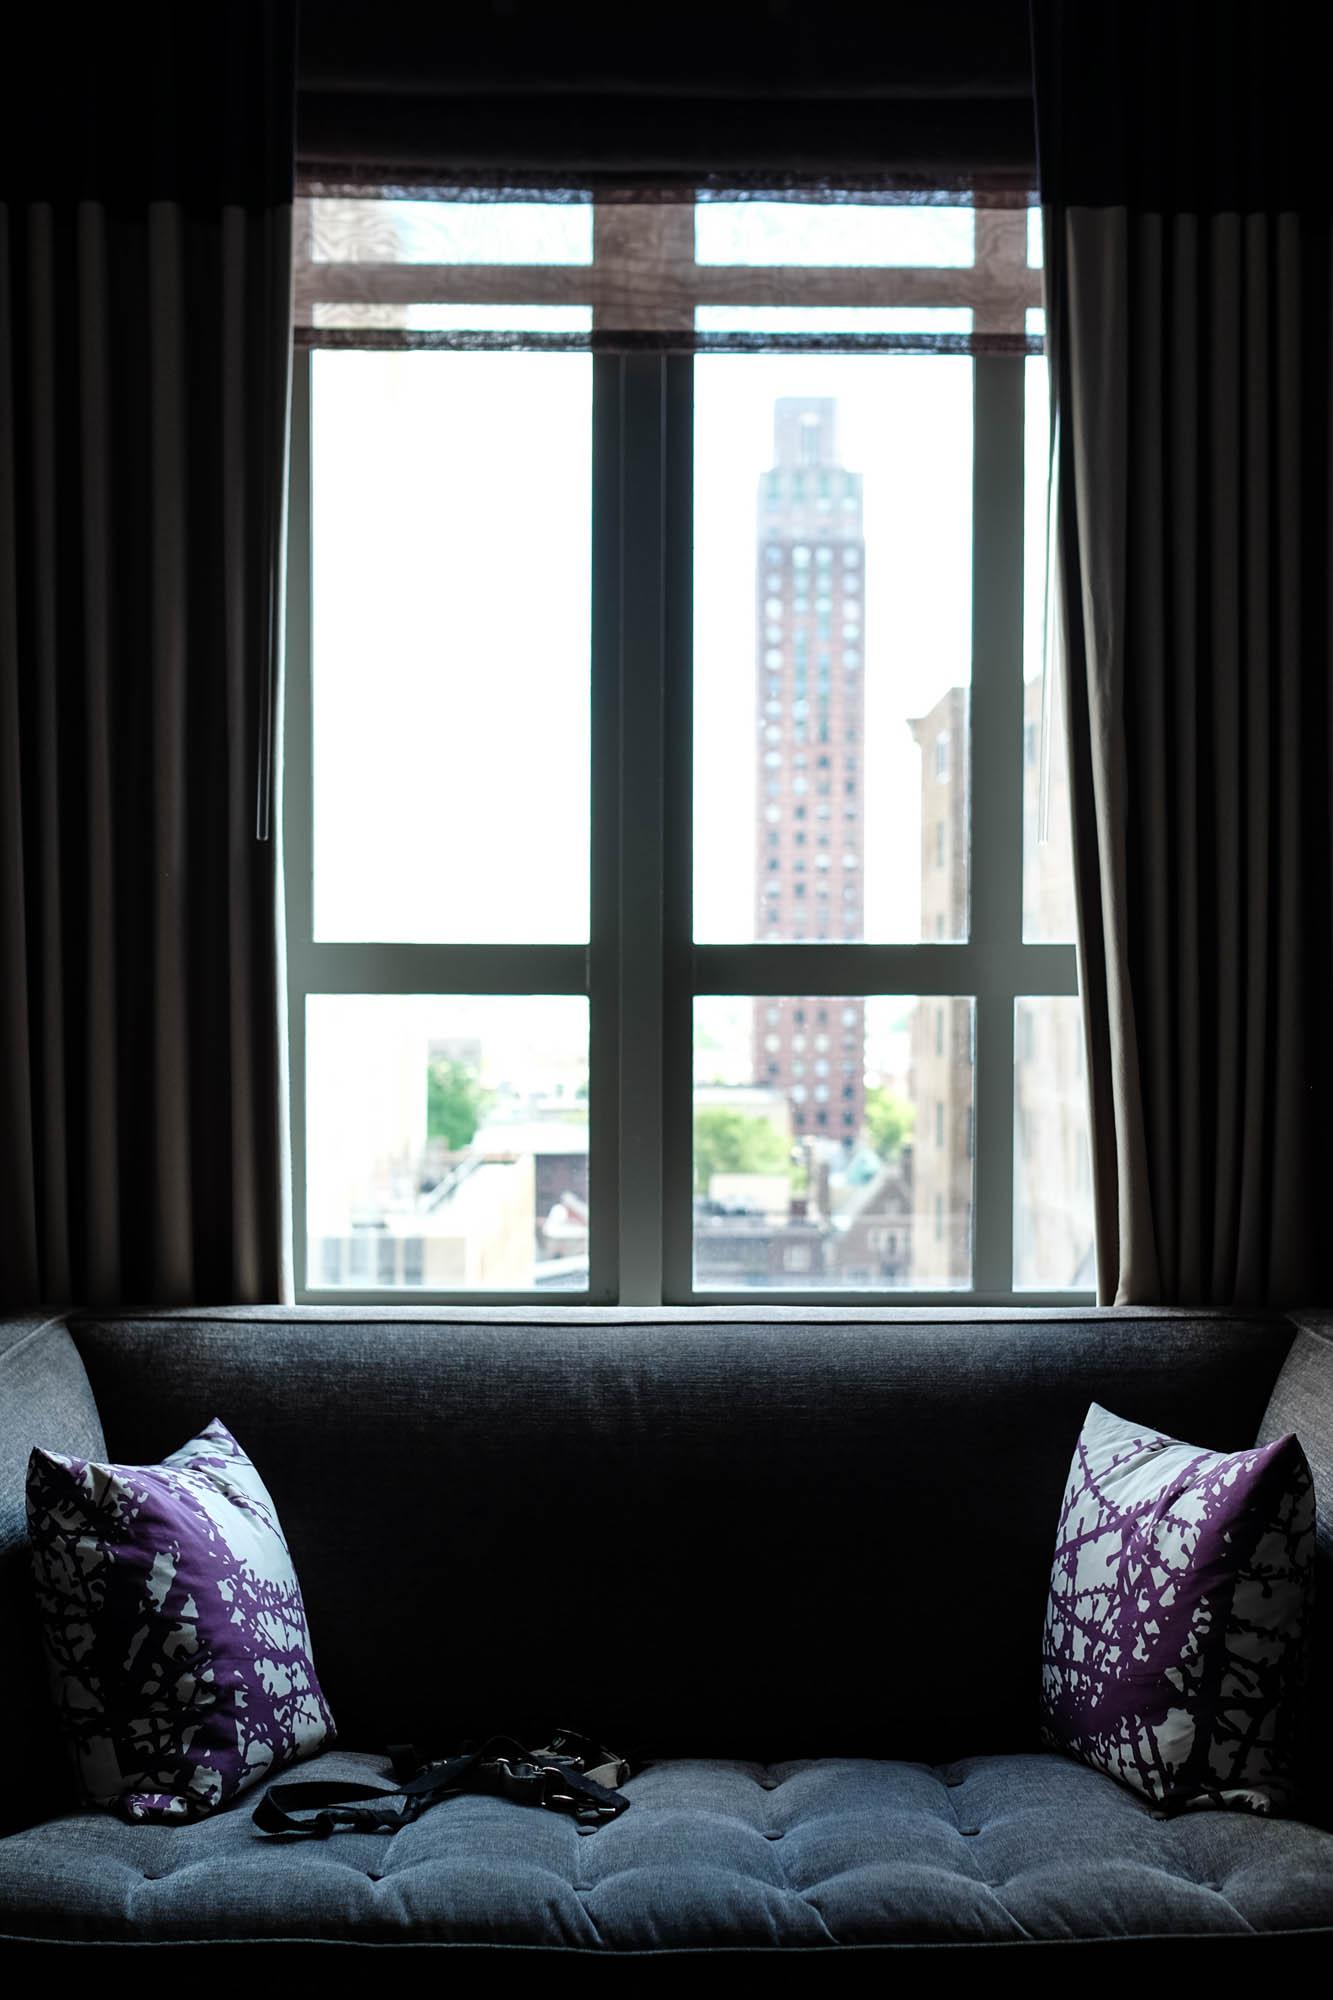 Kimpton_Palomar_Dog_Friendly_Hotel_Philadelphia_Photographer_Kristen_Humbert_9